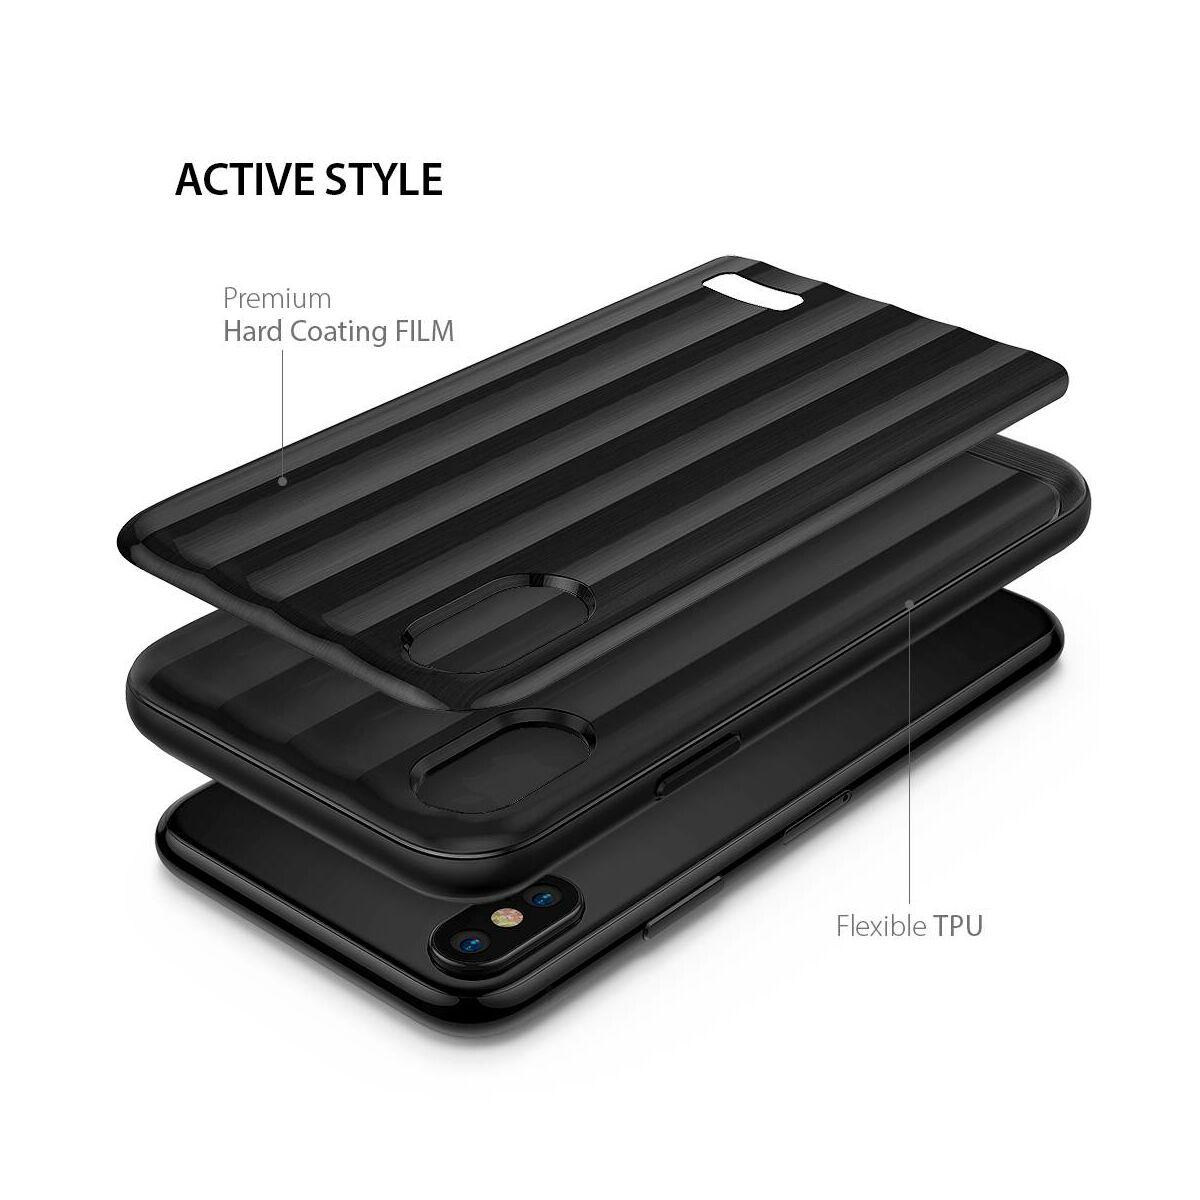 Ringke iPhone X/XS tok, Flex S Pro Titanium, fekete